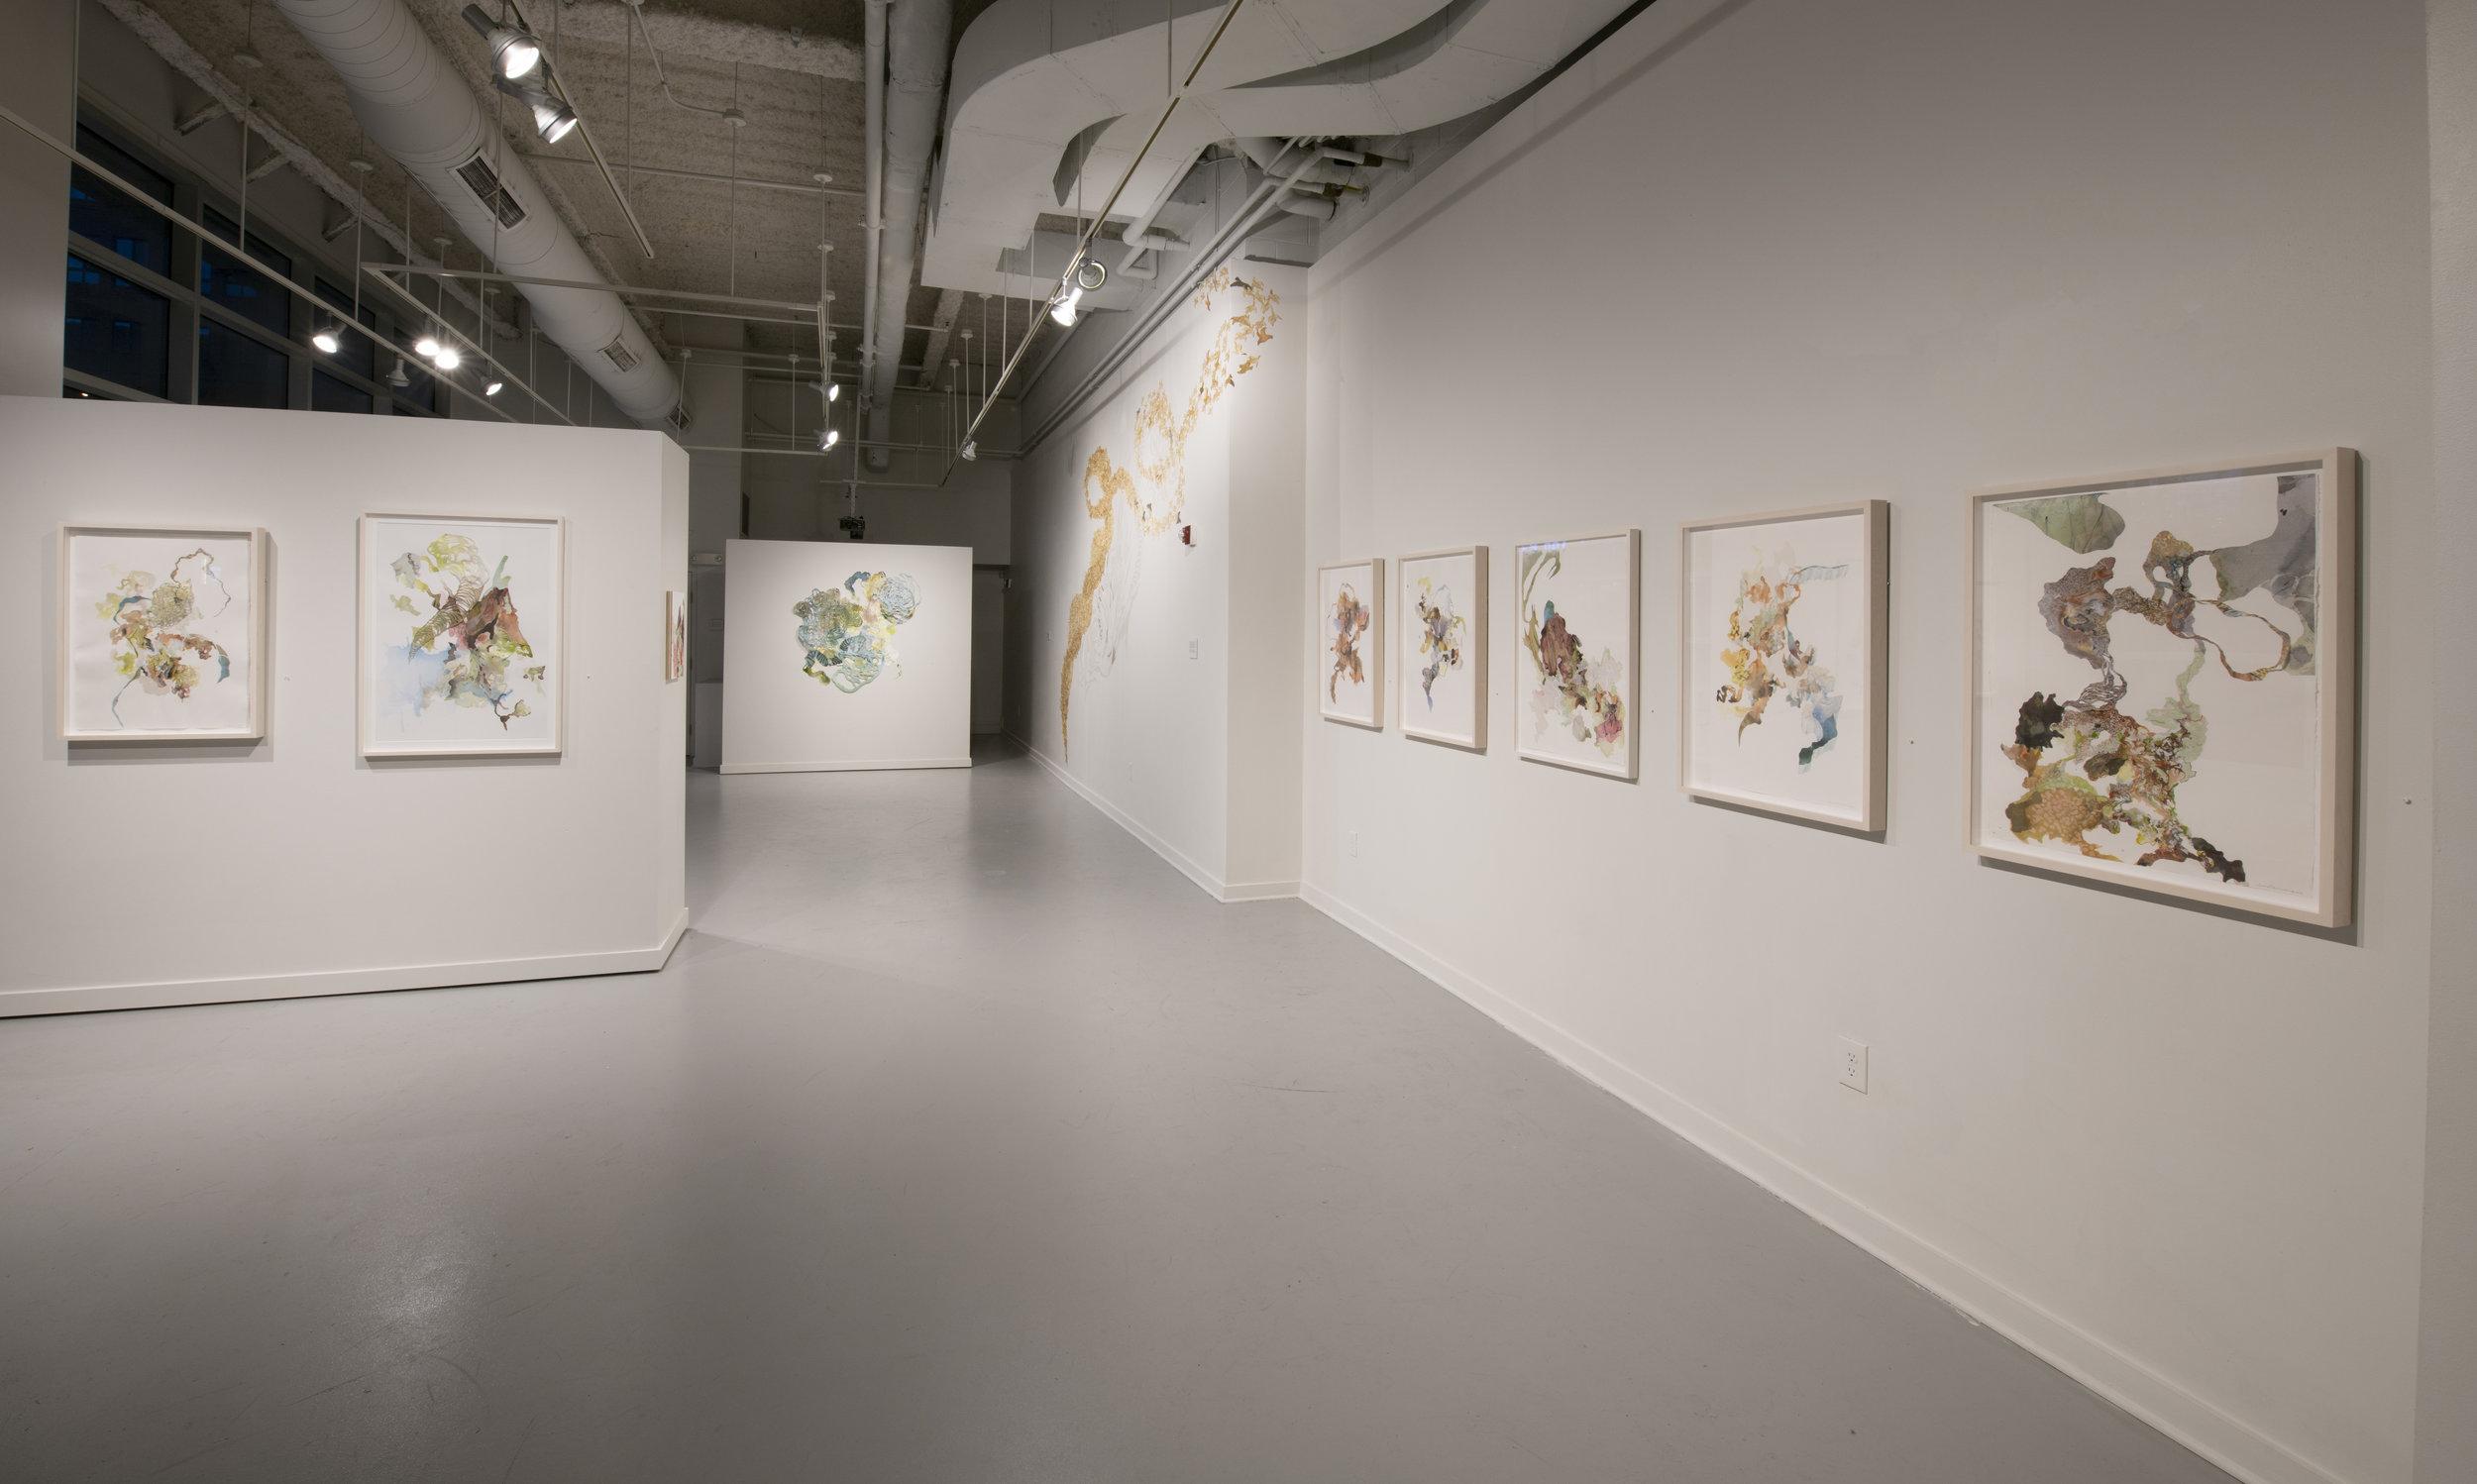 Substance of Matter   Exhibition at Vis Arts in Rockville, MD  2018